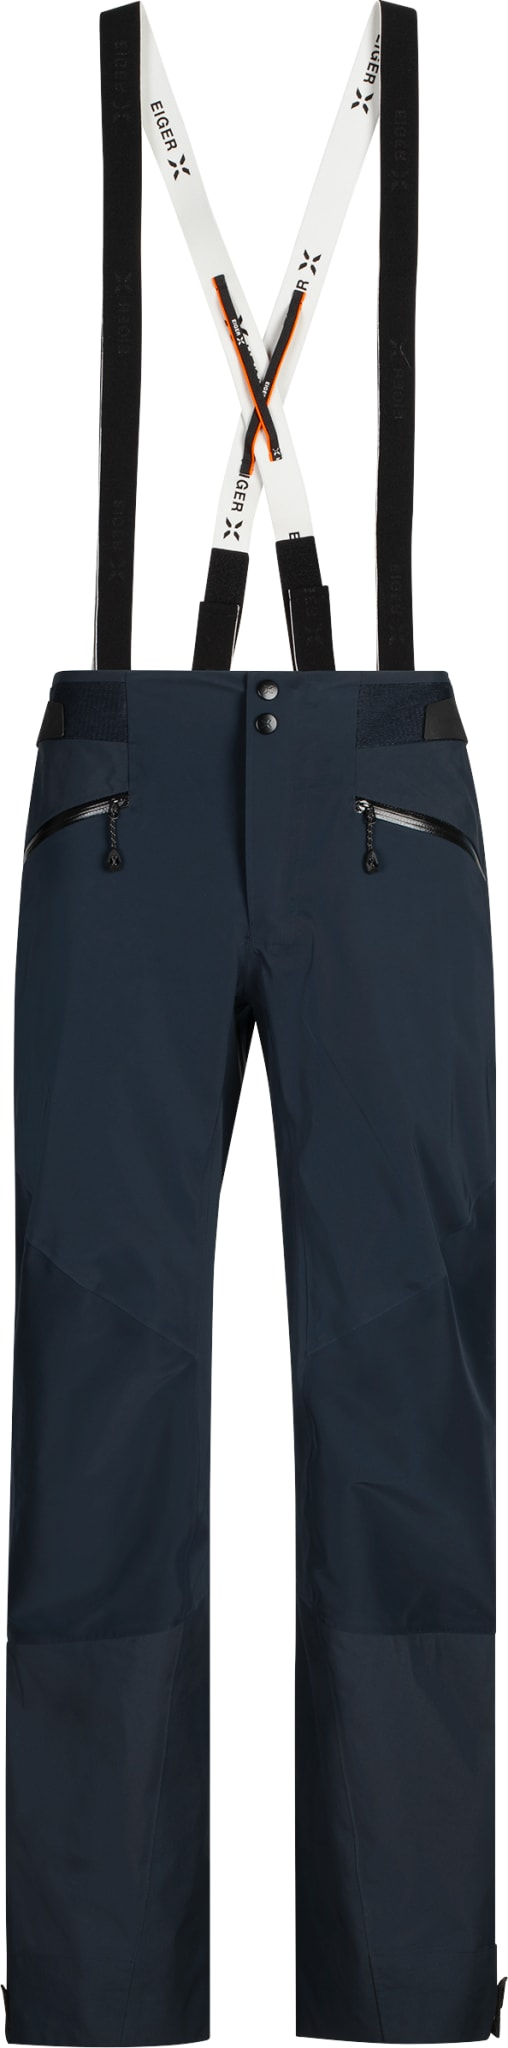 Nordwand Pro HS Pants Ms